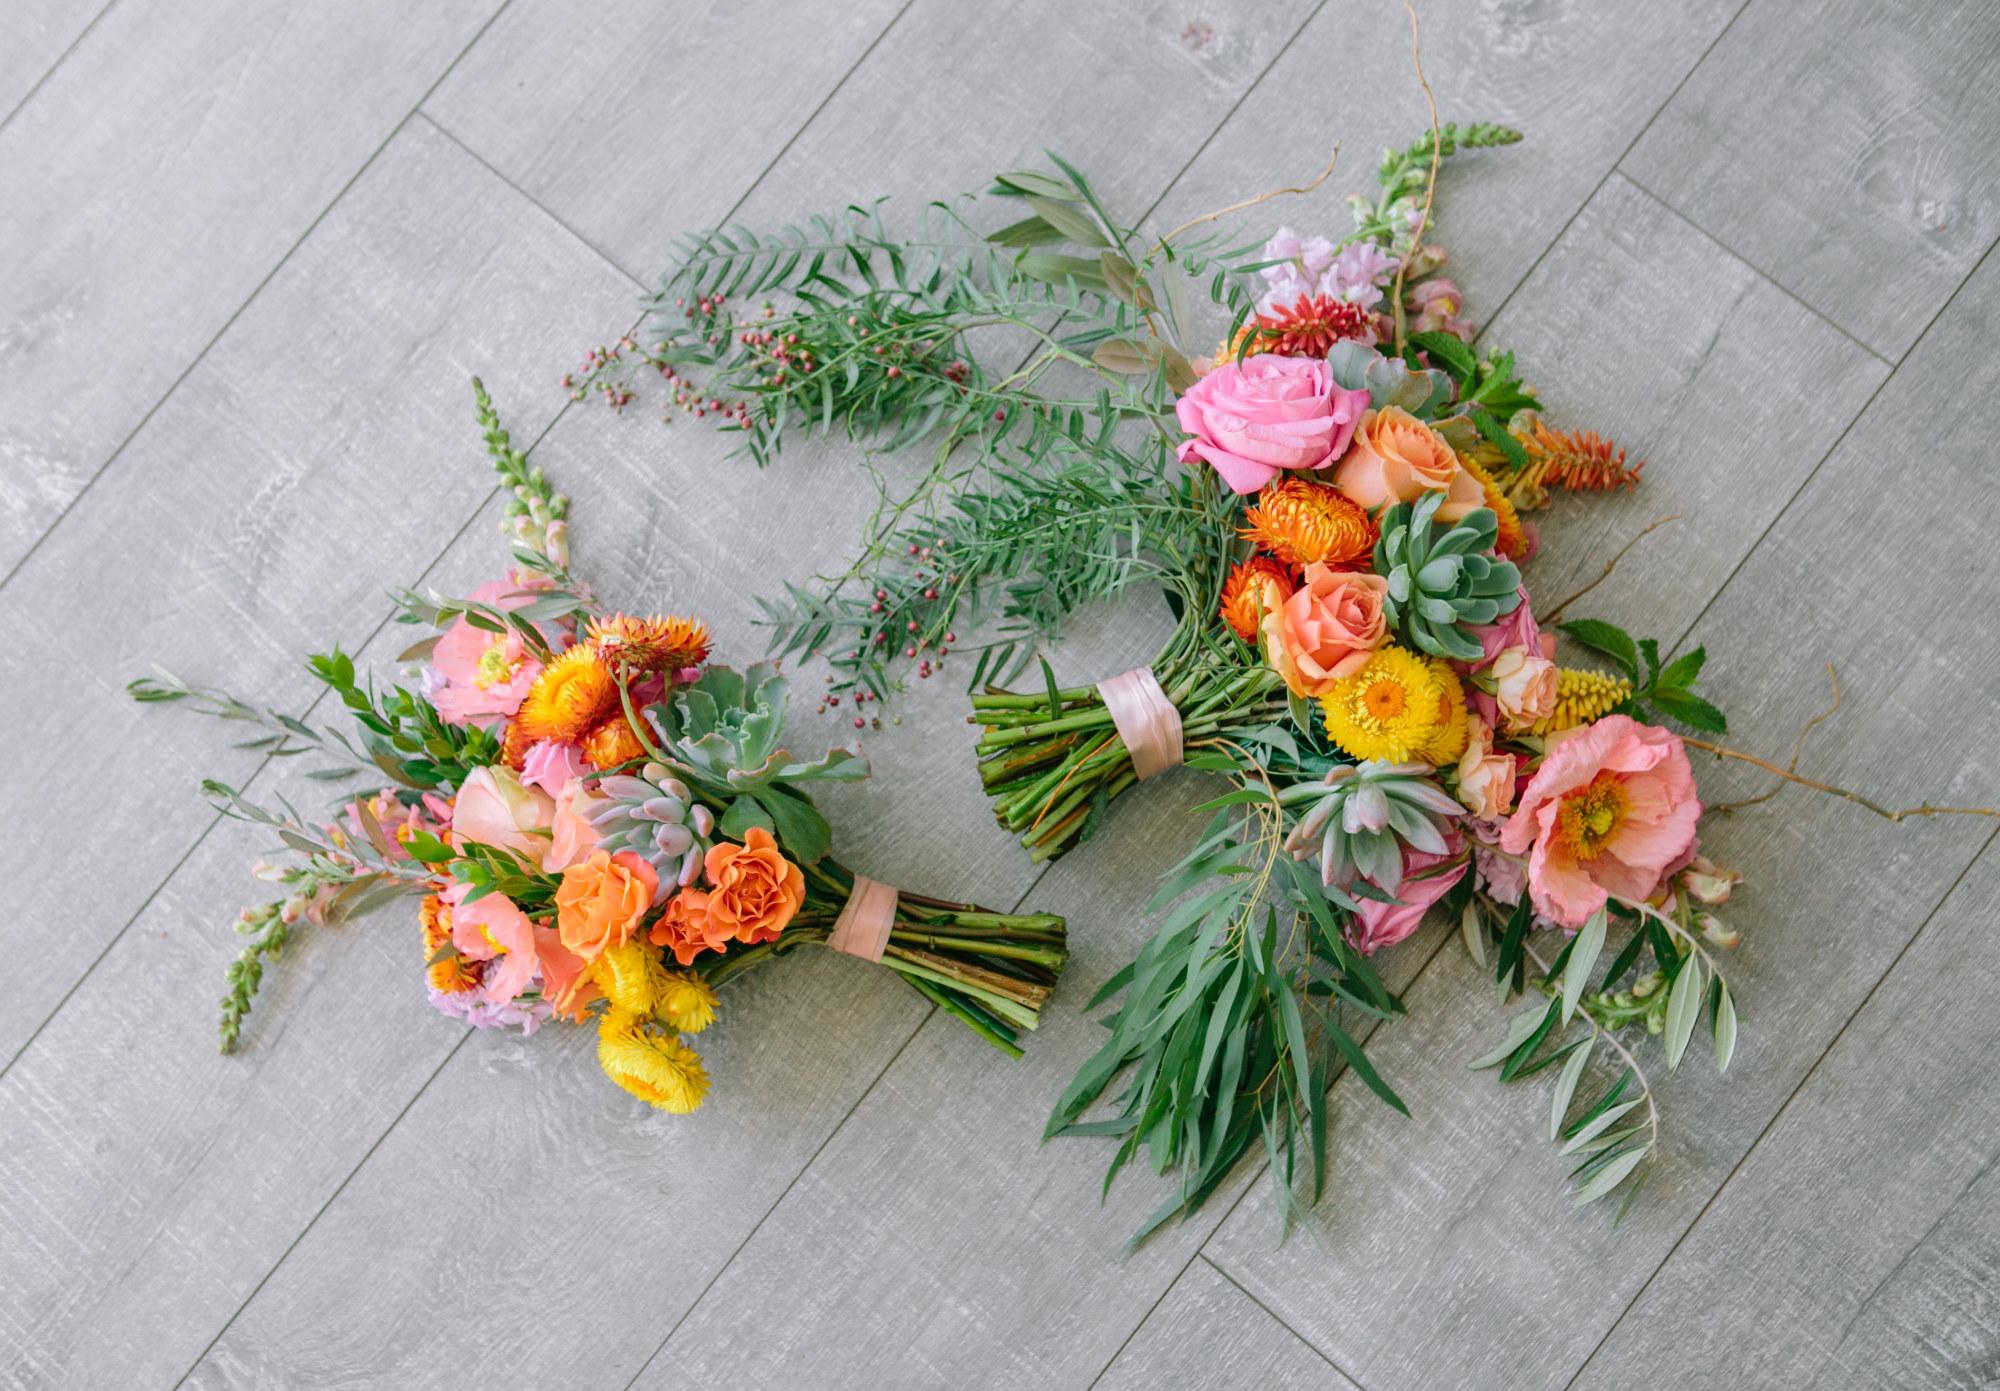 Bright_Florals_Two_Bouquets_Sibyl_Sophia_Des Moines.jpg